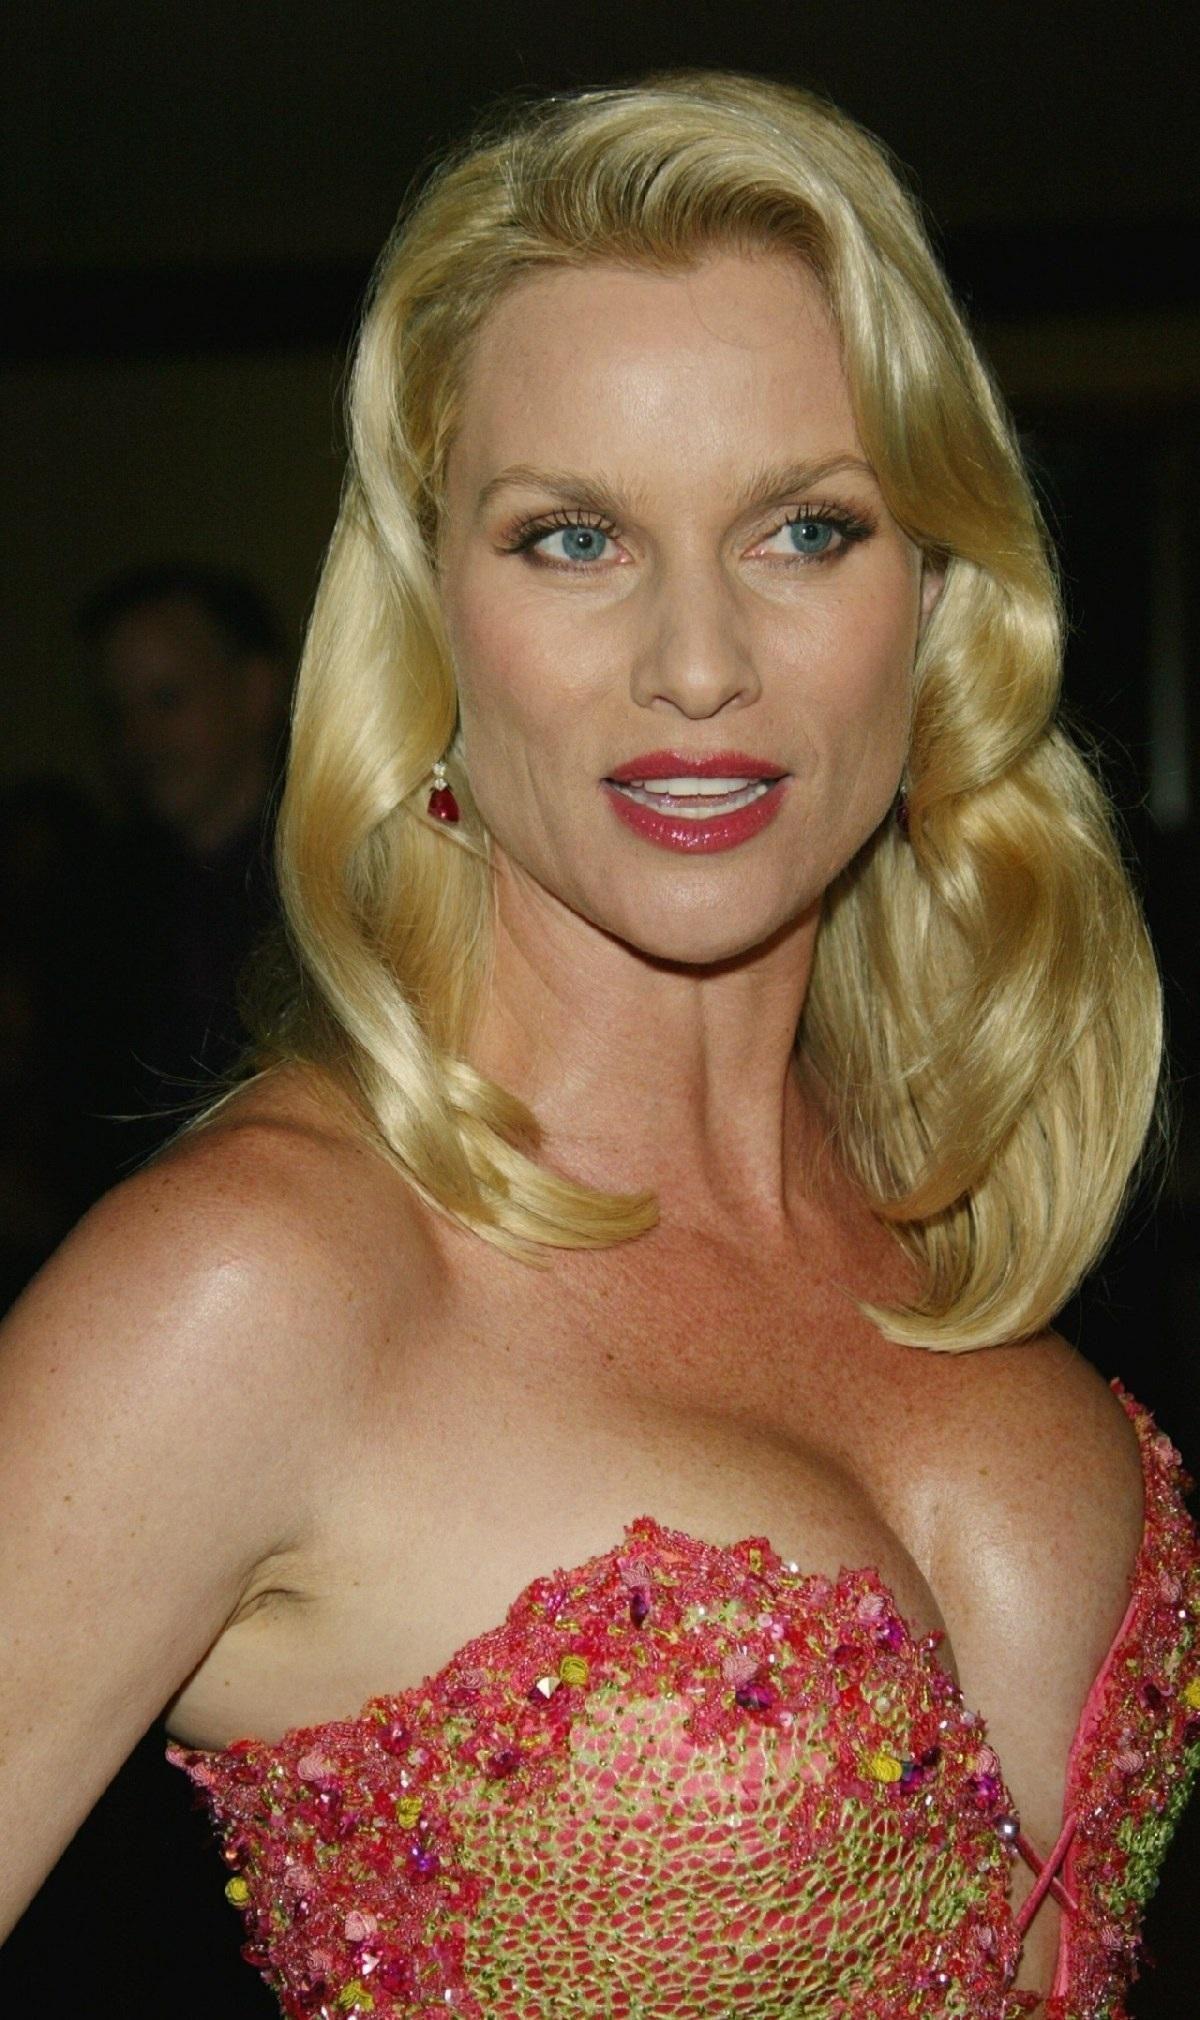 Celebrites Nicollette Sheridan nudes (52 images), Boobs